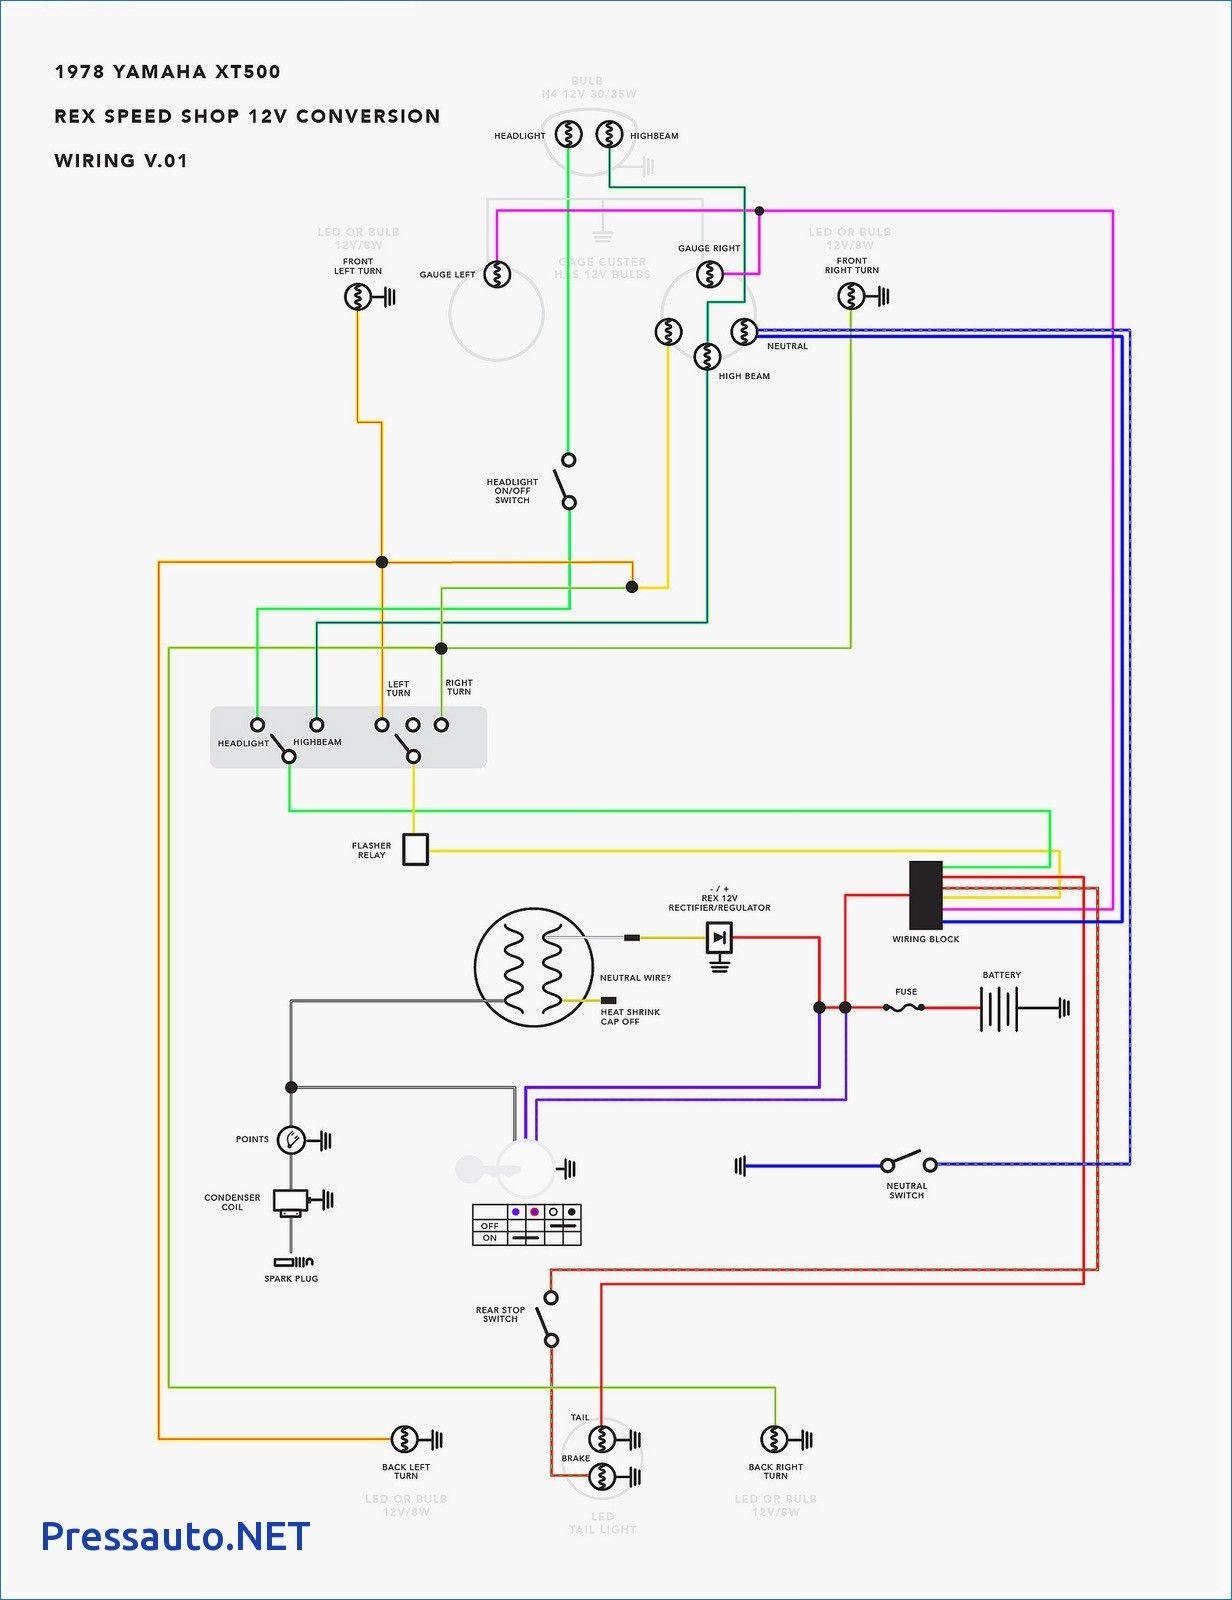 Ih 574 Wiring Harness Kubota Bx Tractor Wiring Diagrams For Wiring Diagram Schematics